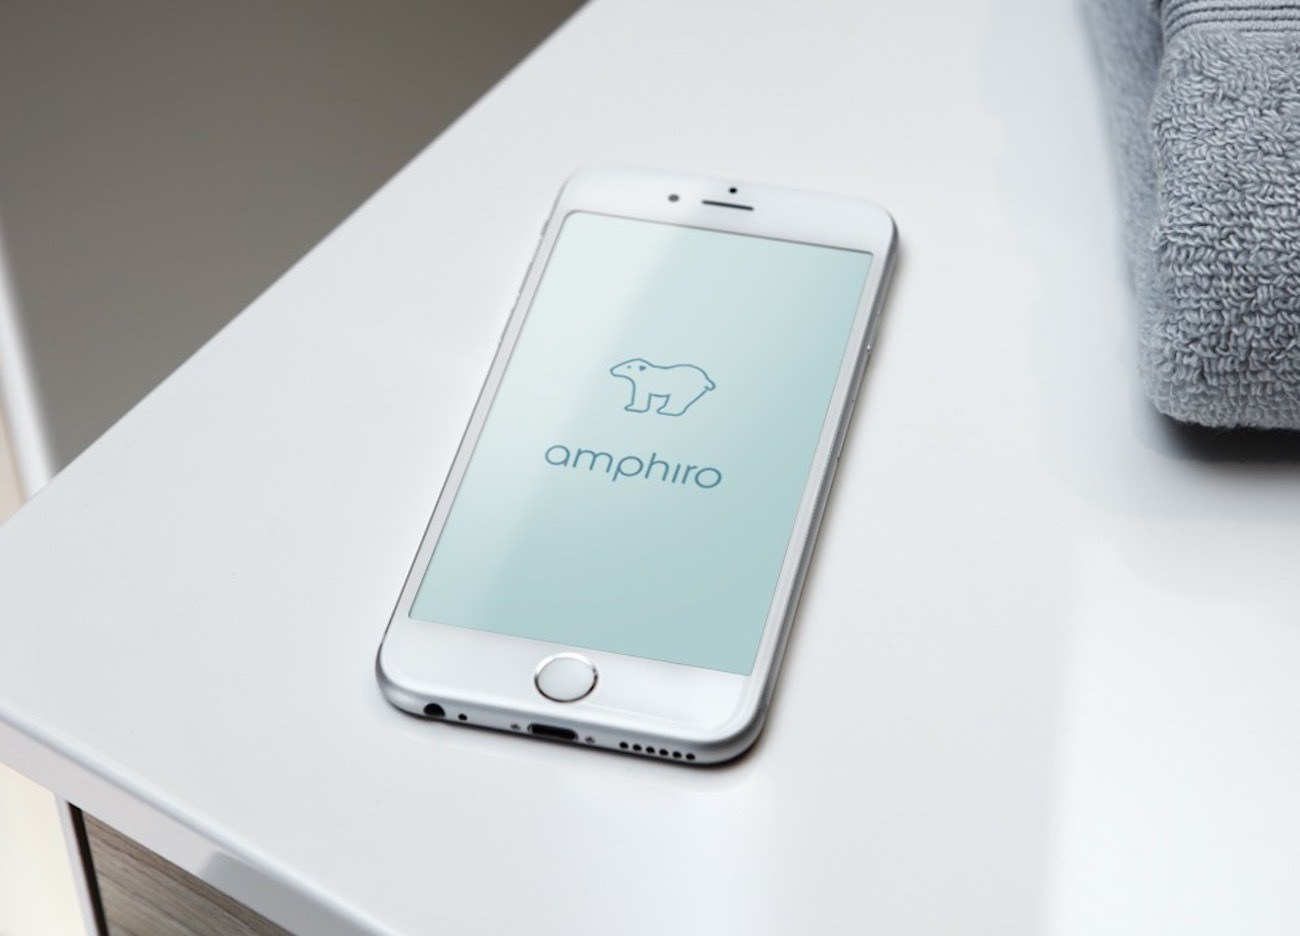 Amphrio A1 Smart Shower Meter